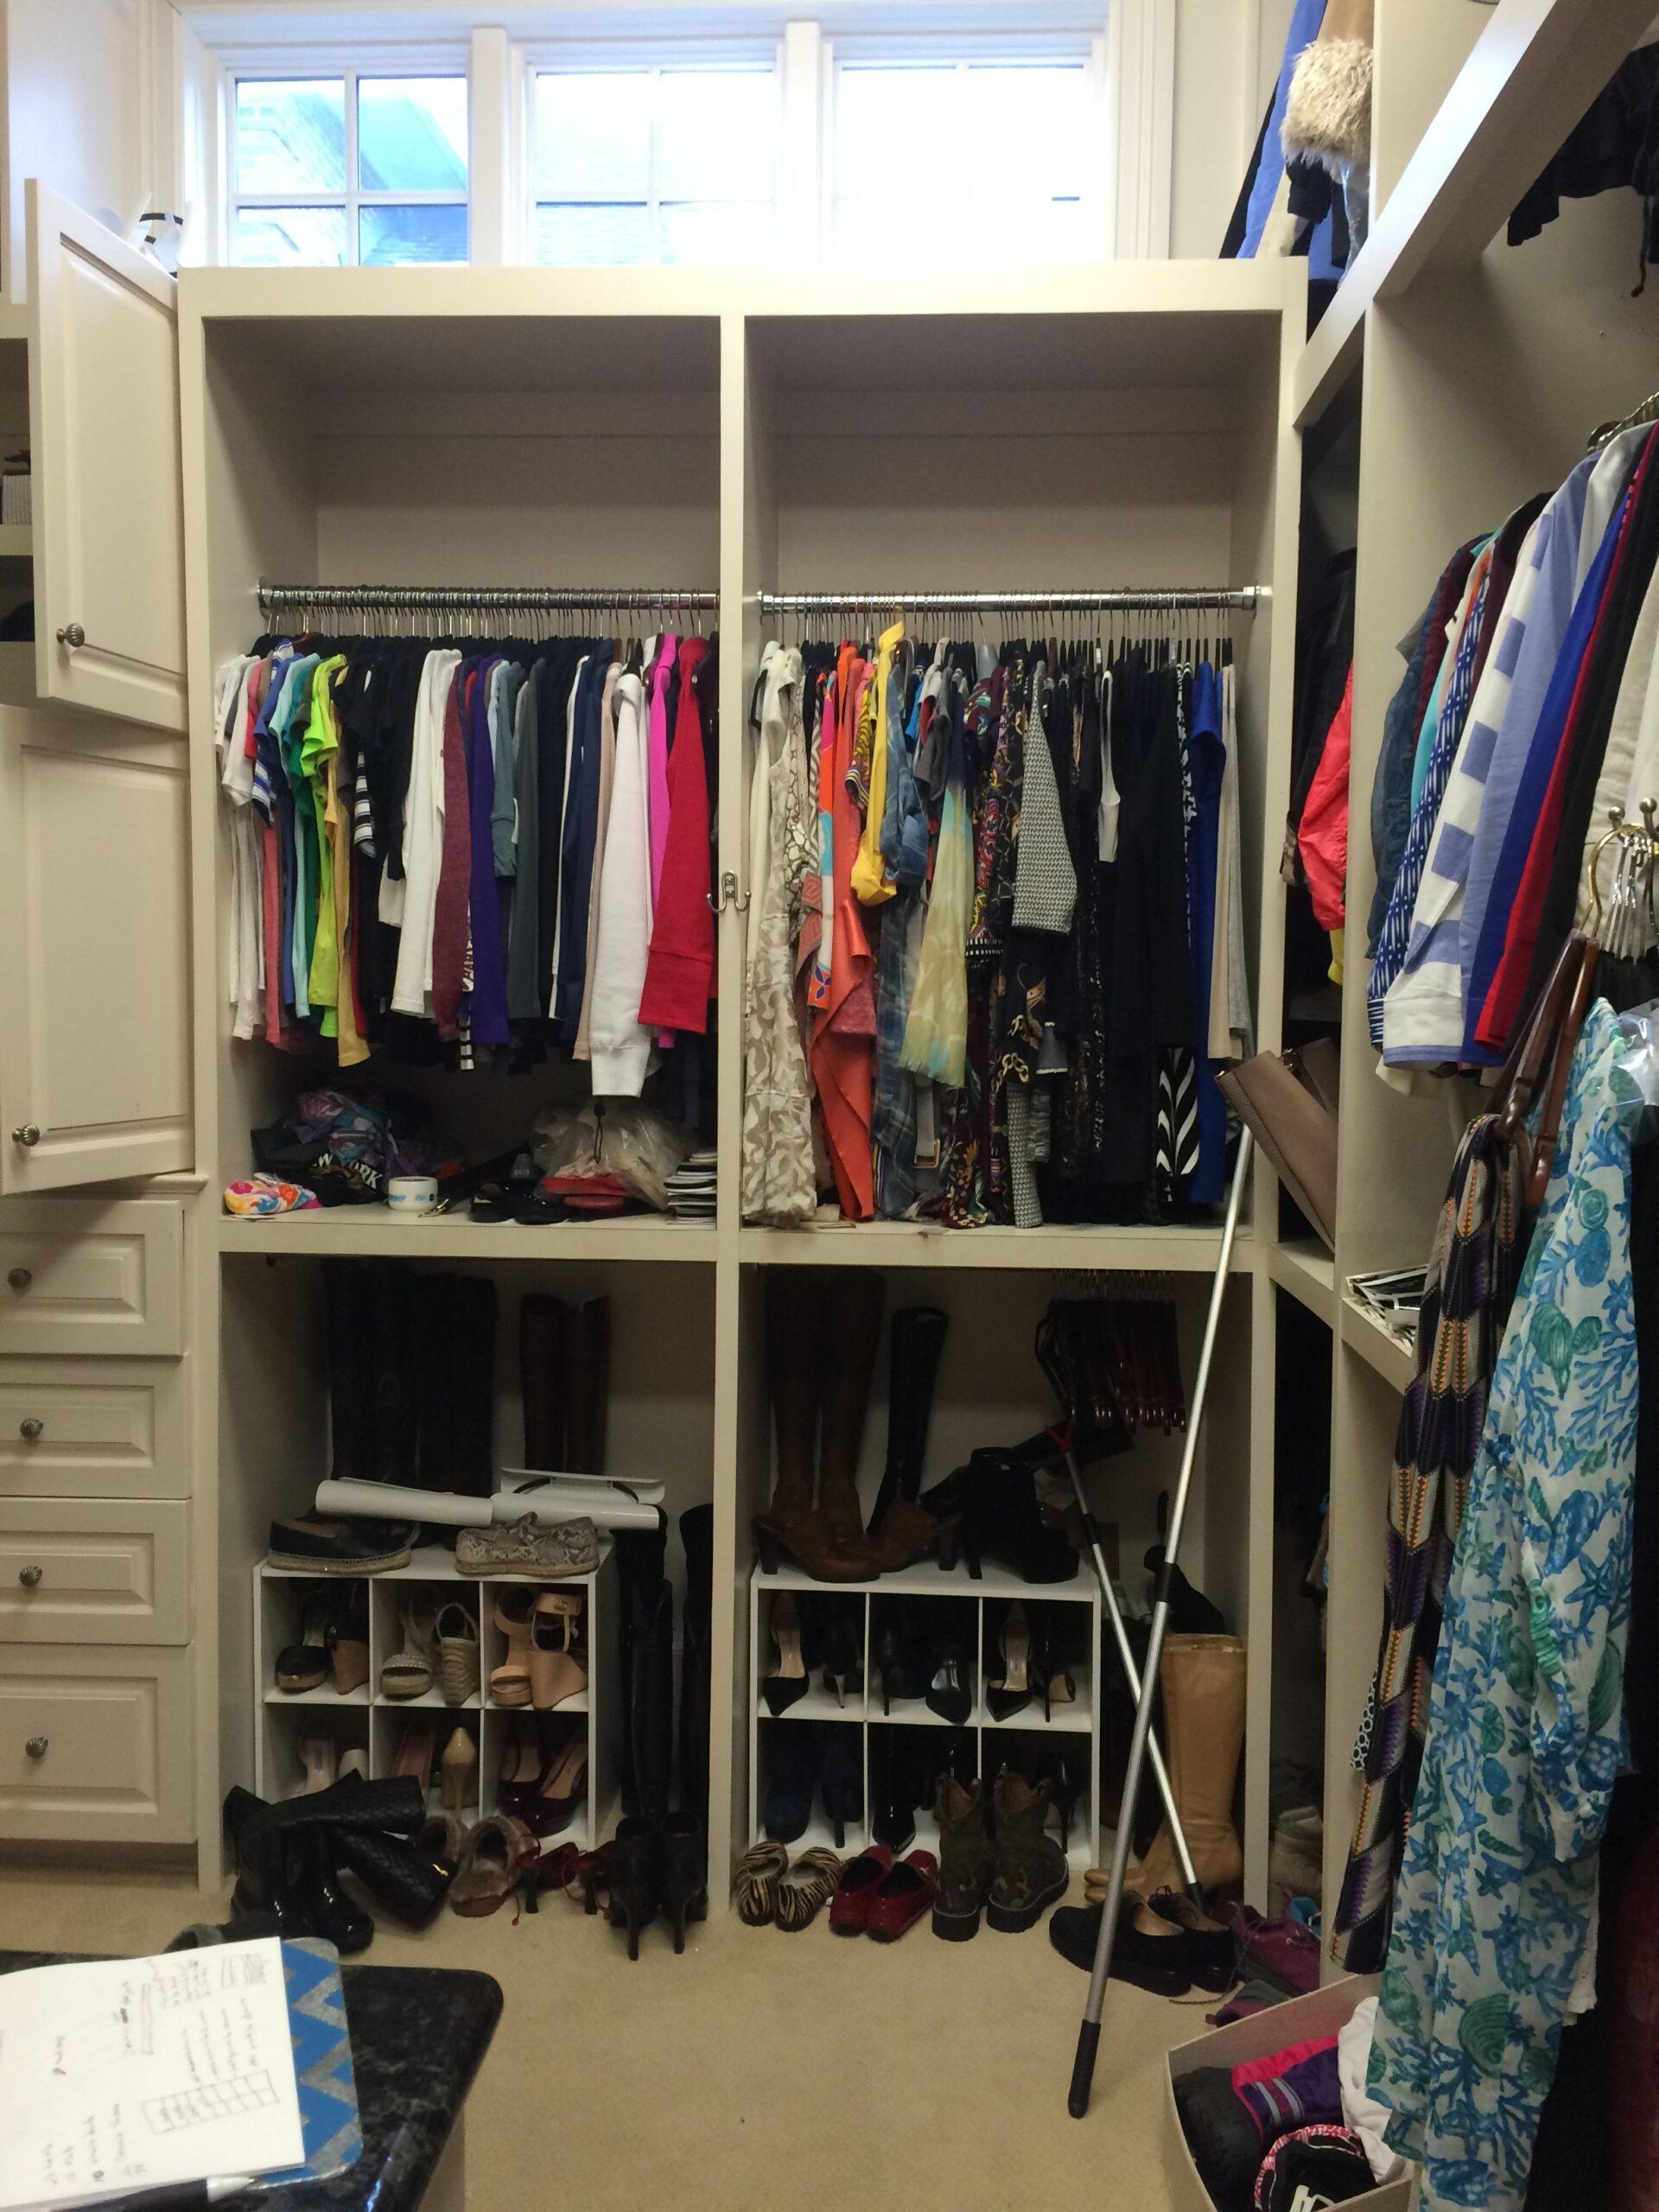 disorganized full closet